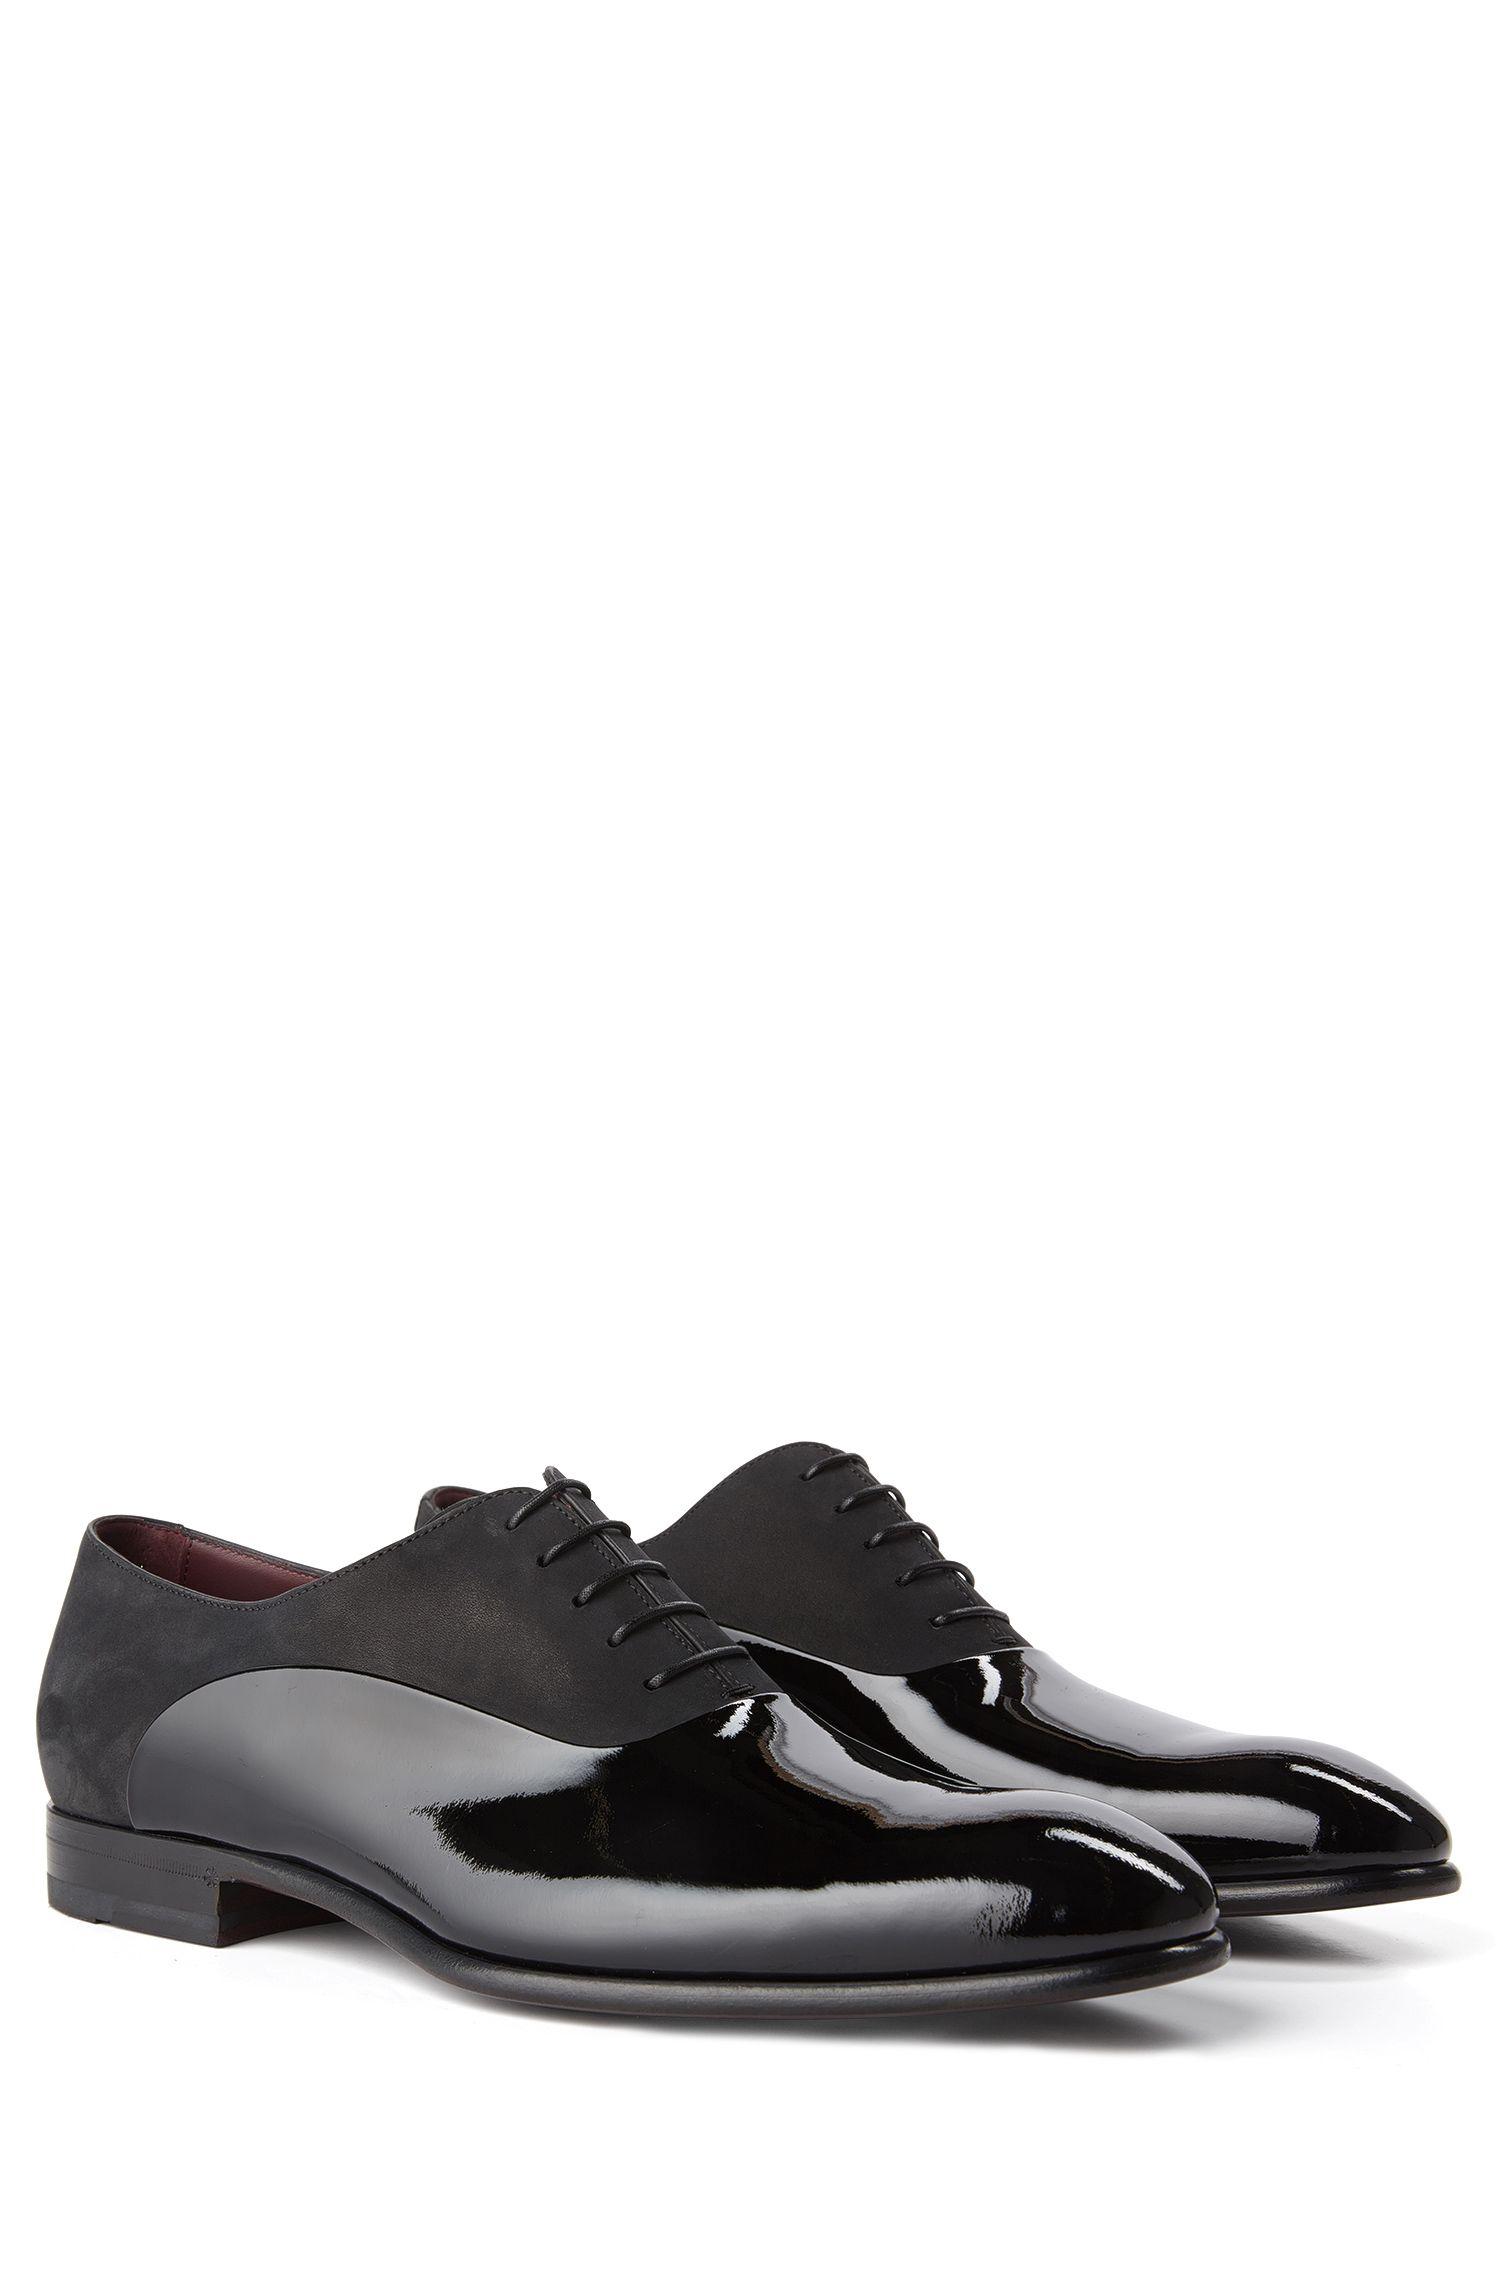 'T-Legend Oxfr Panu' | Italian Calfskin Nubuck Patent Oxford Dress Shoes